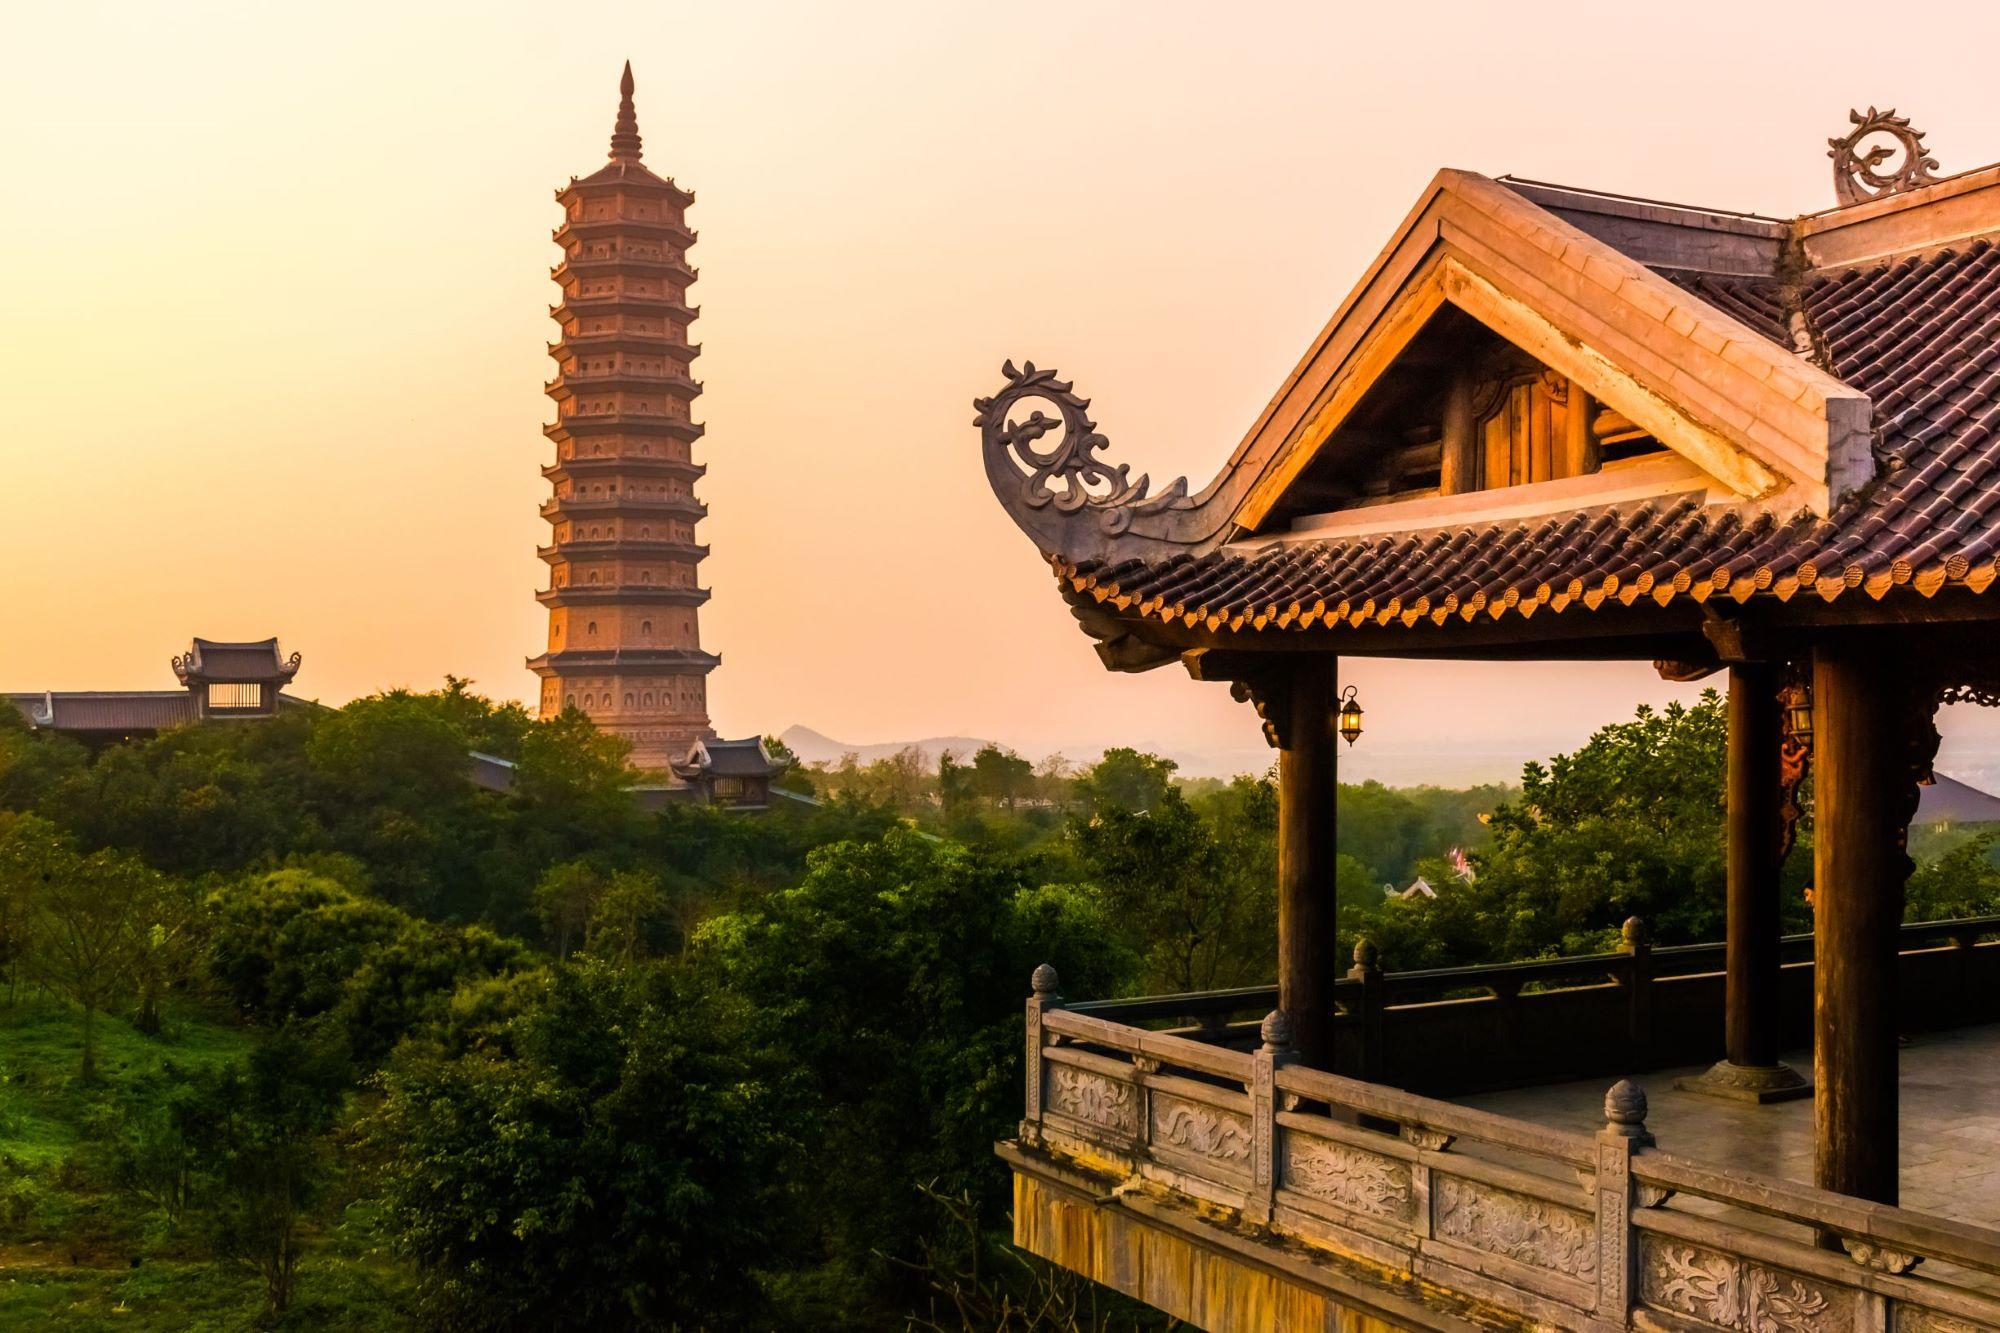 The biggiest temple complex in Vietnam